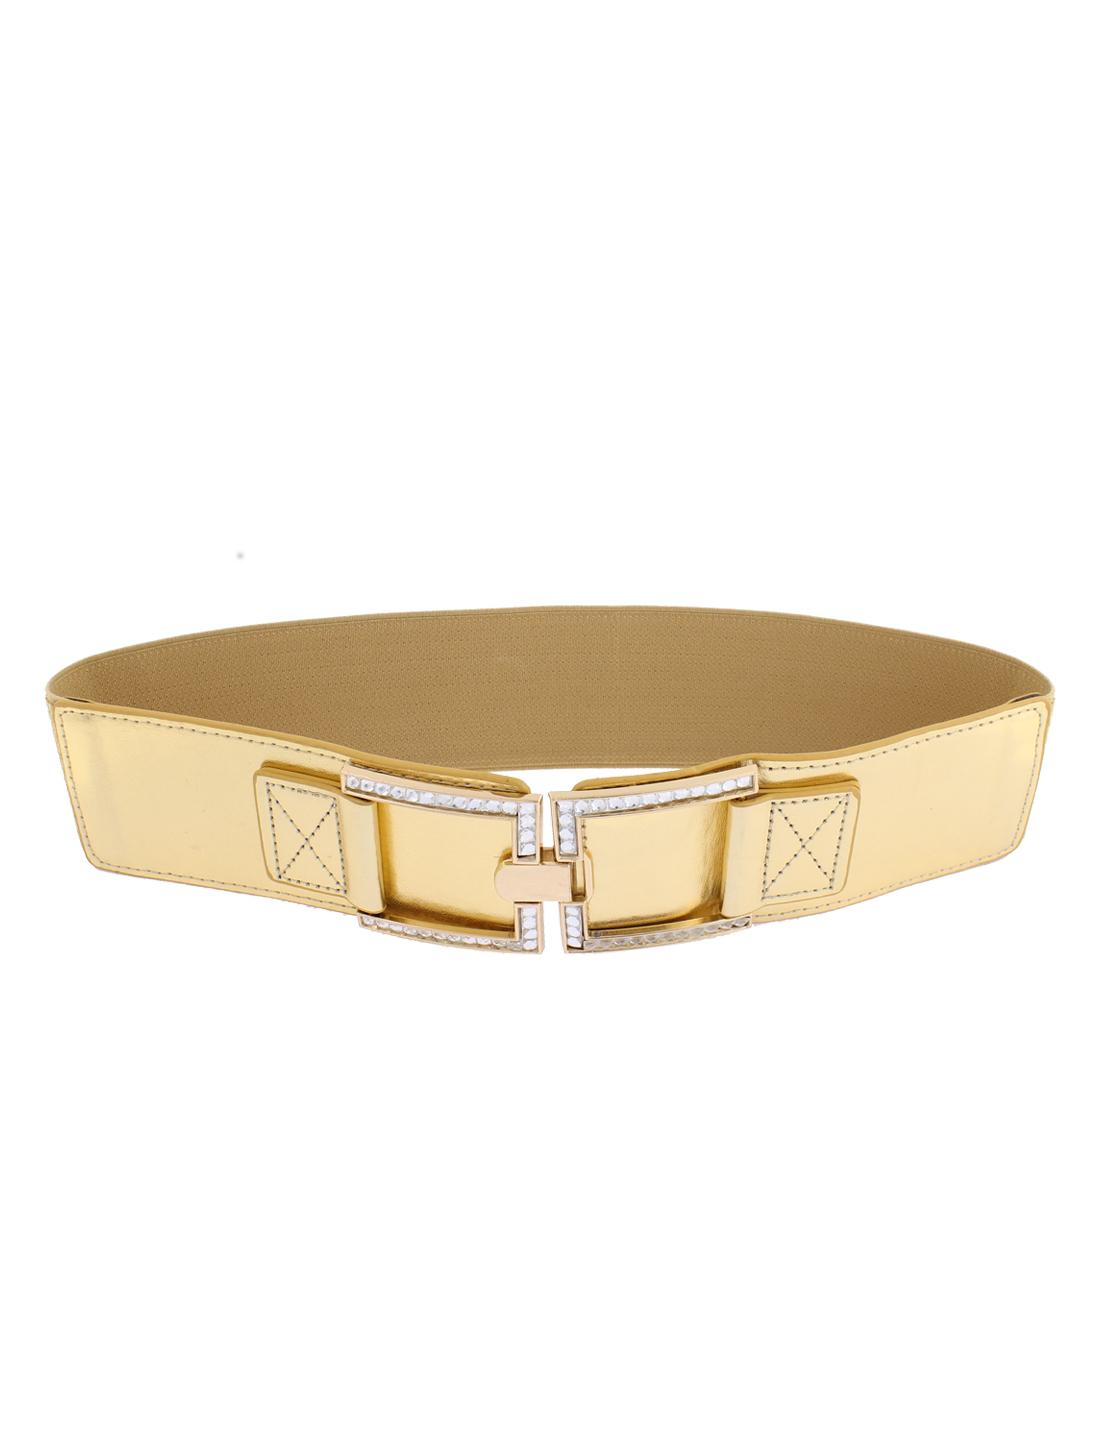 Adjustable Elastic Wide Waistband Waist Belt Gold Tone for Lady